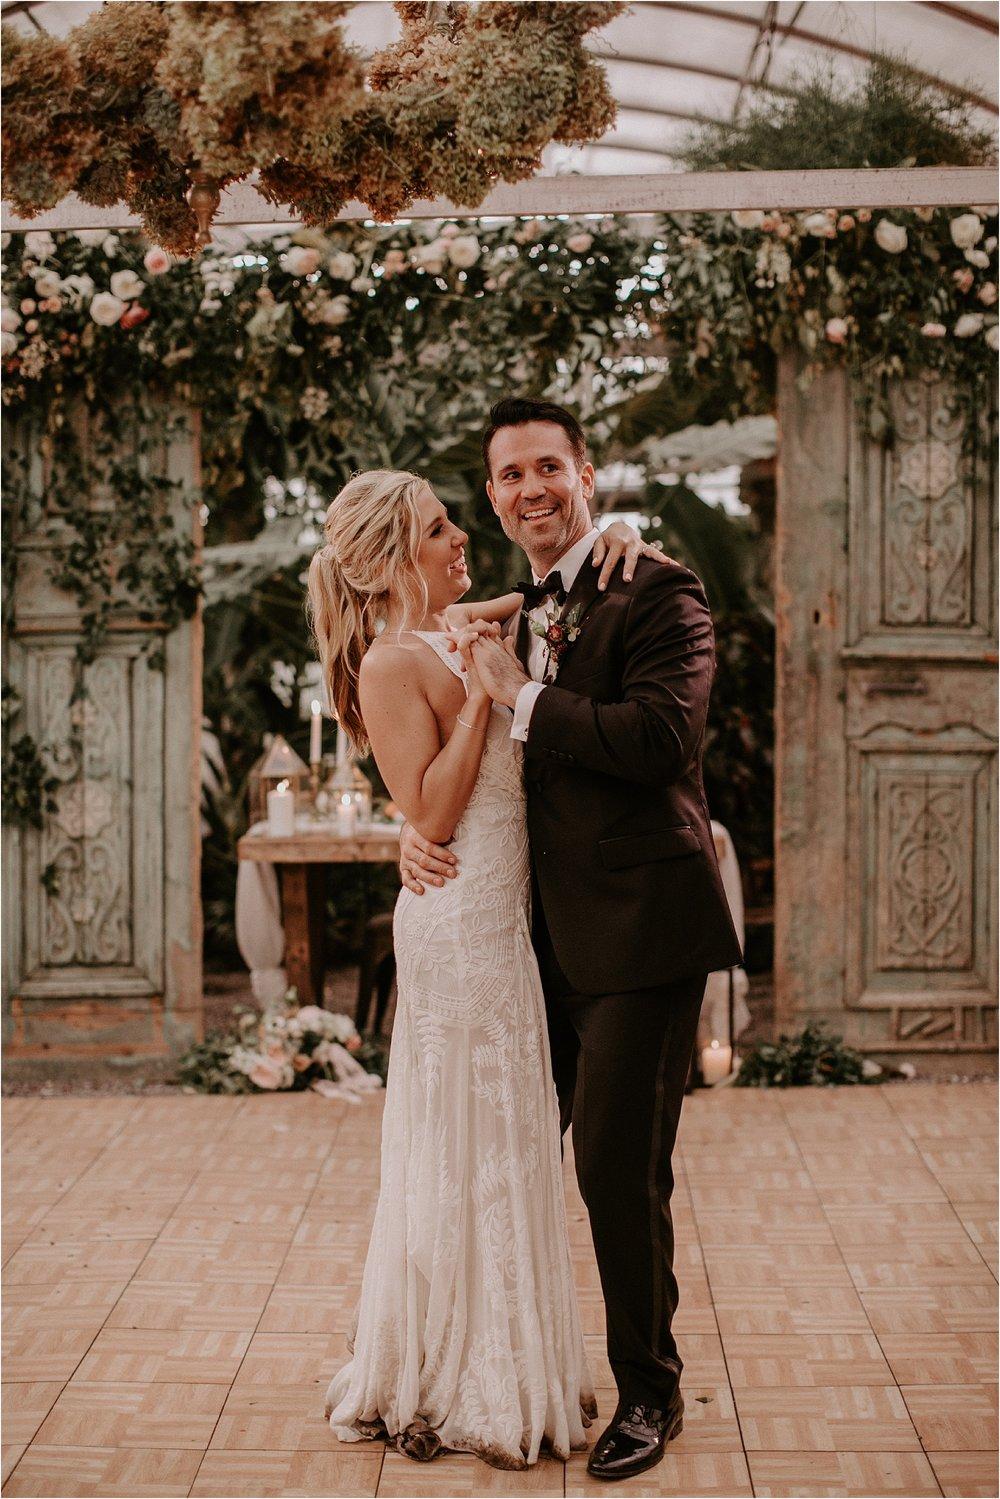 Sarah_Brookhart_Hortulus_Farm_Garden_and_Nursey_Wedding_Photographer_0068.jpg